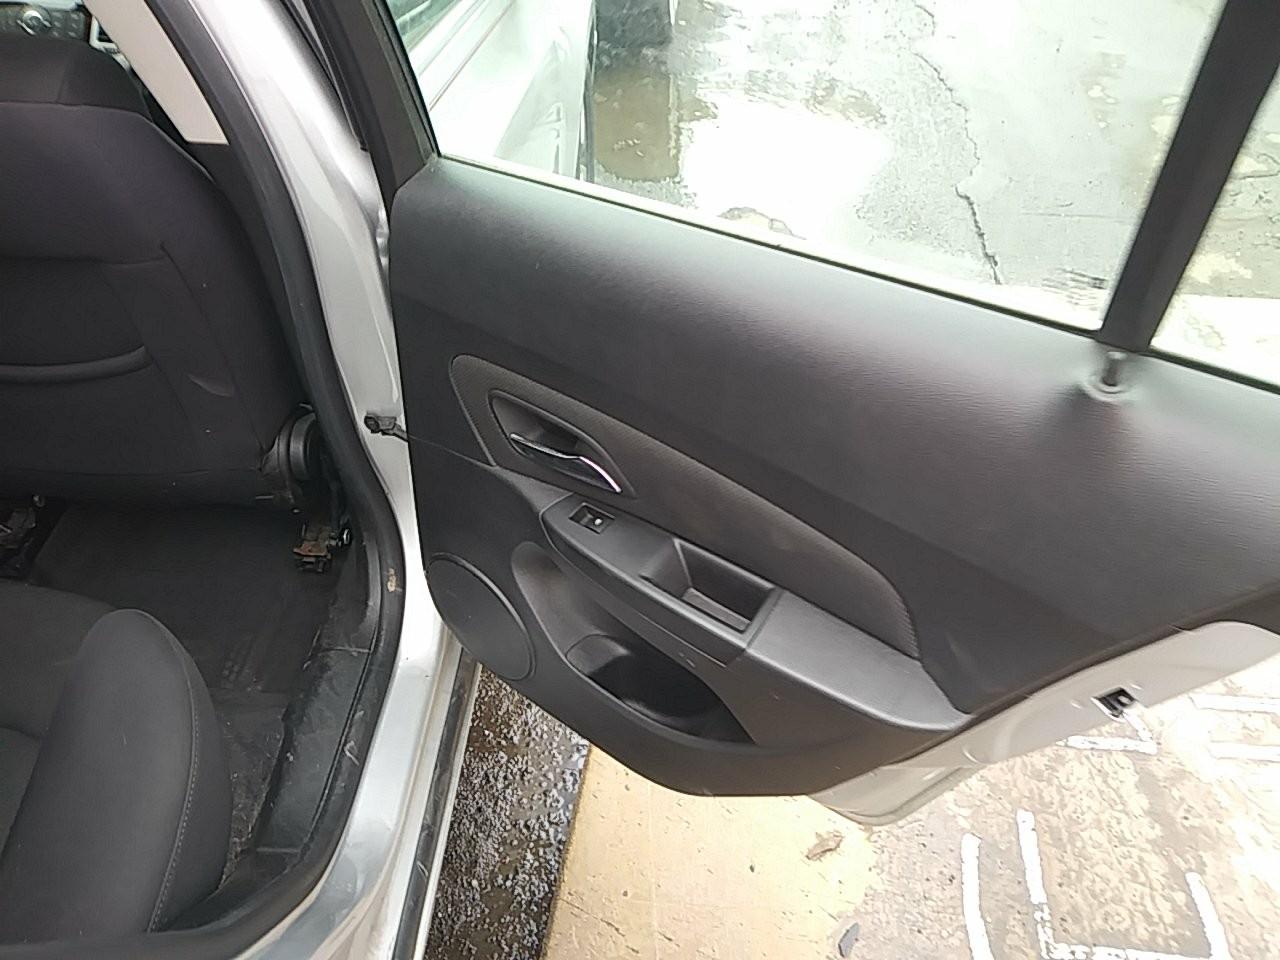 Chevrolet Cruze 1.4(lt) 2012 İkinci əl  $6500